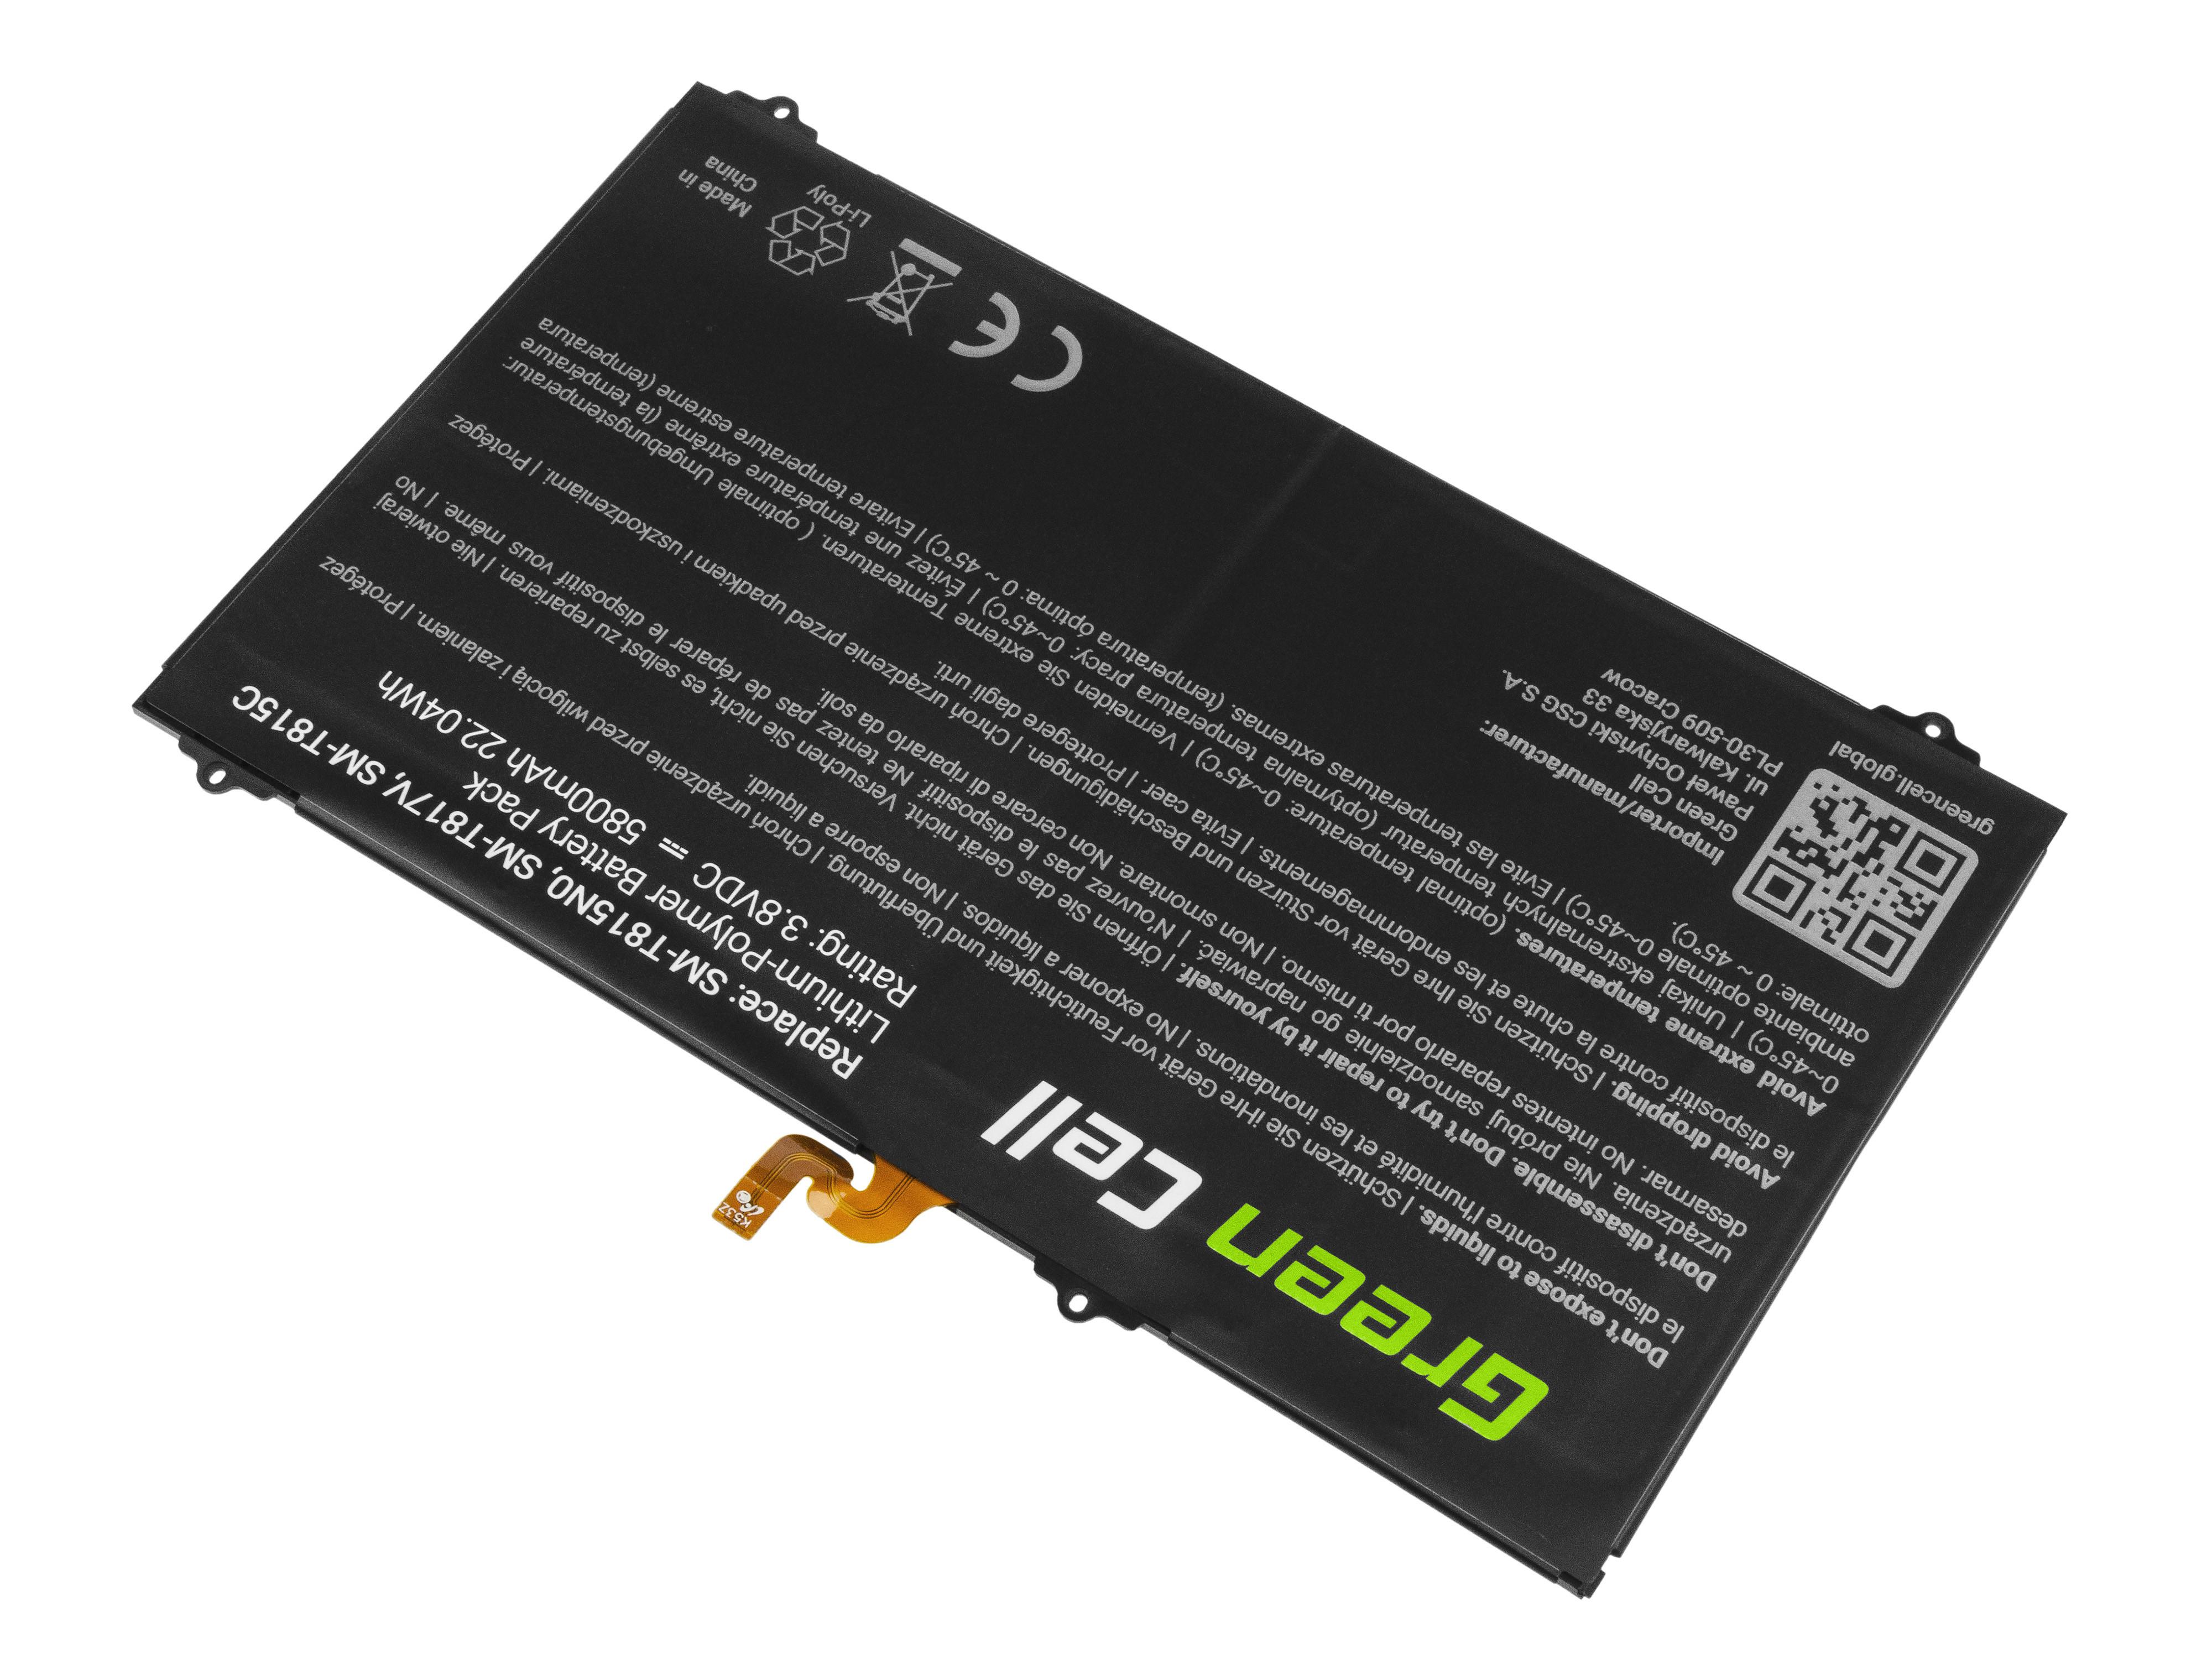 Green Cell TAB39 Baterie Samsung EB-BT810ABA EB-BT810ABE pro Samsung Galaxy Tab S2 9.7 T810 T813 T815 T819 5800mAh Li-Pol – neoriginální